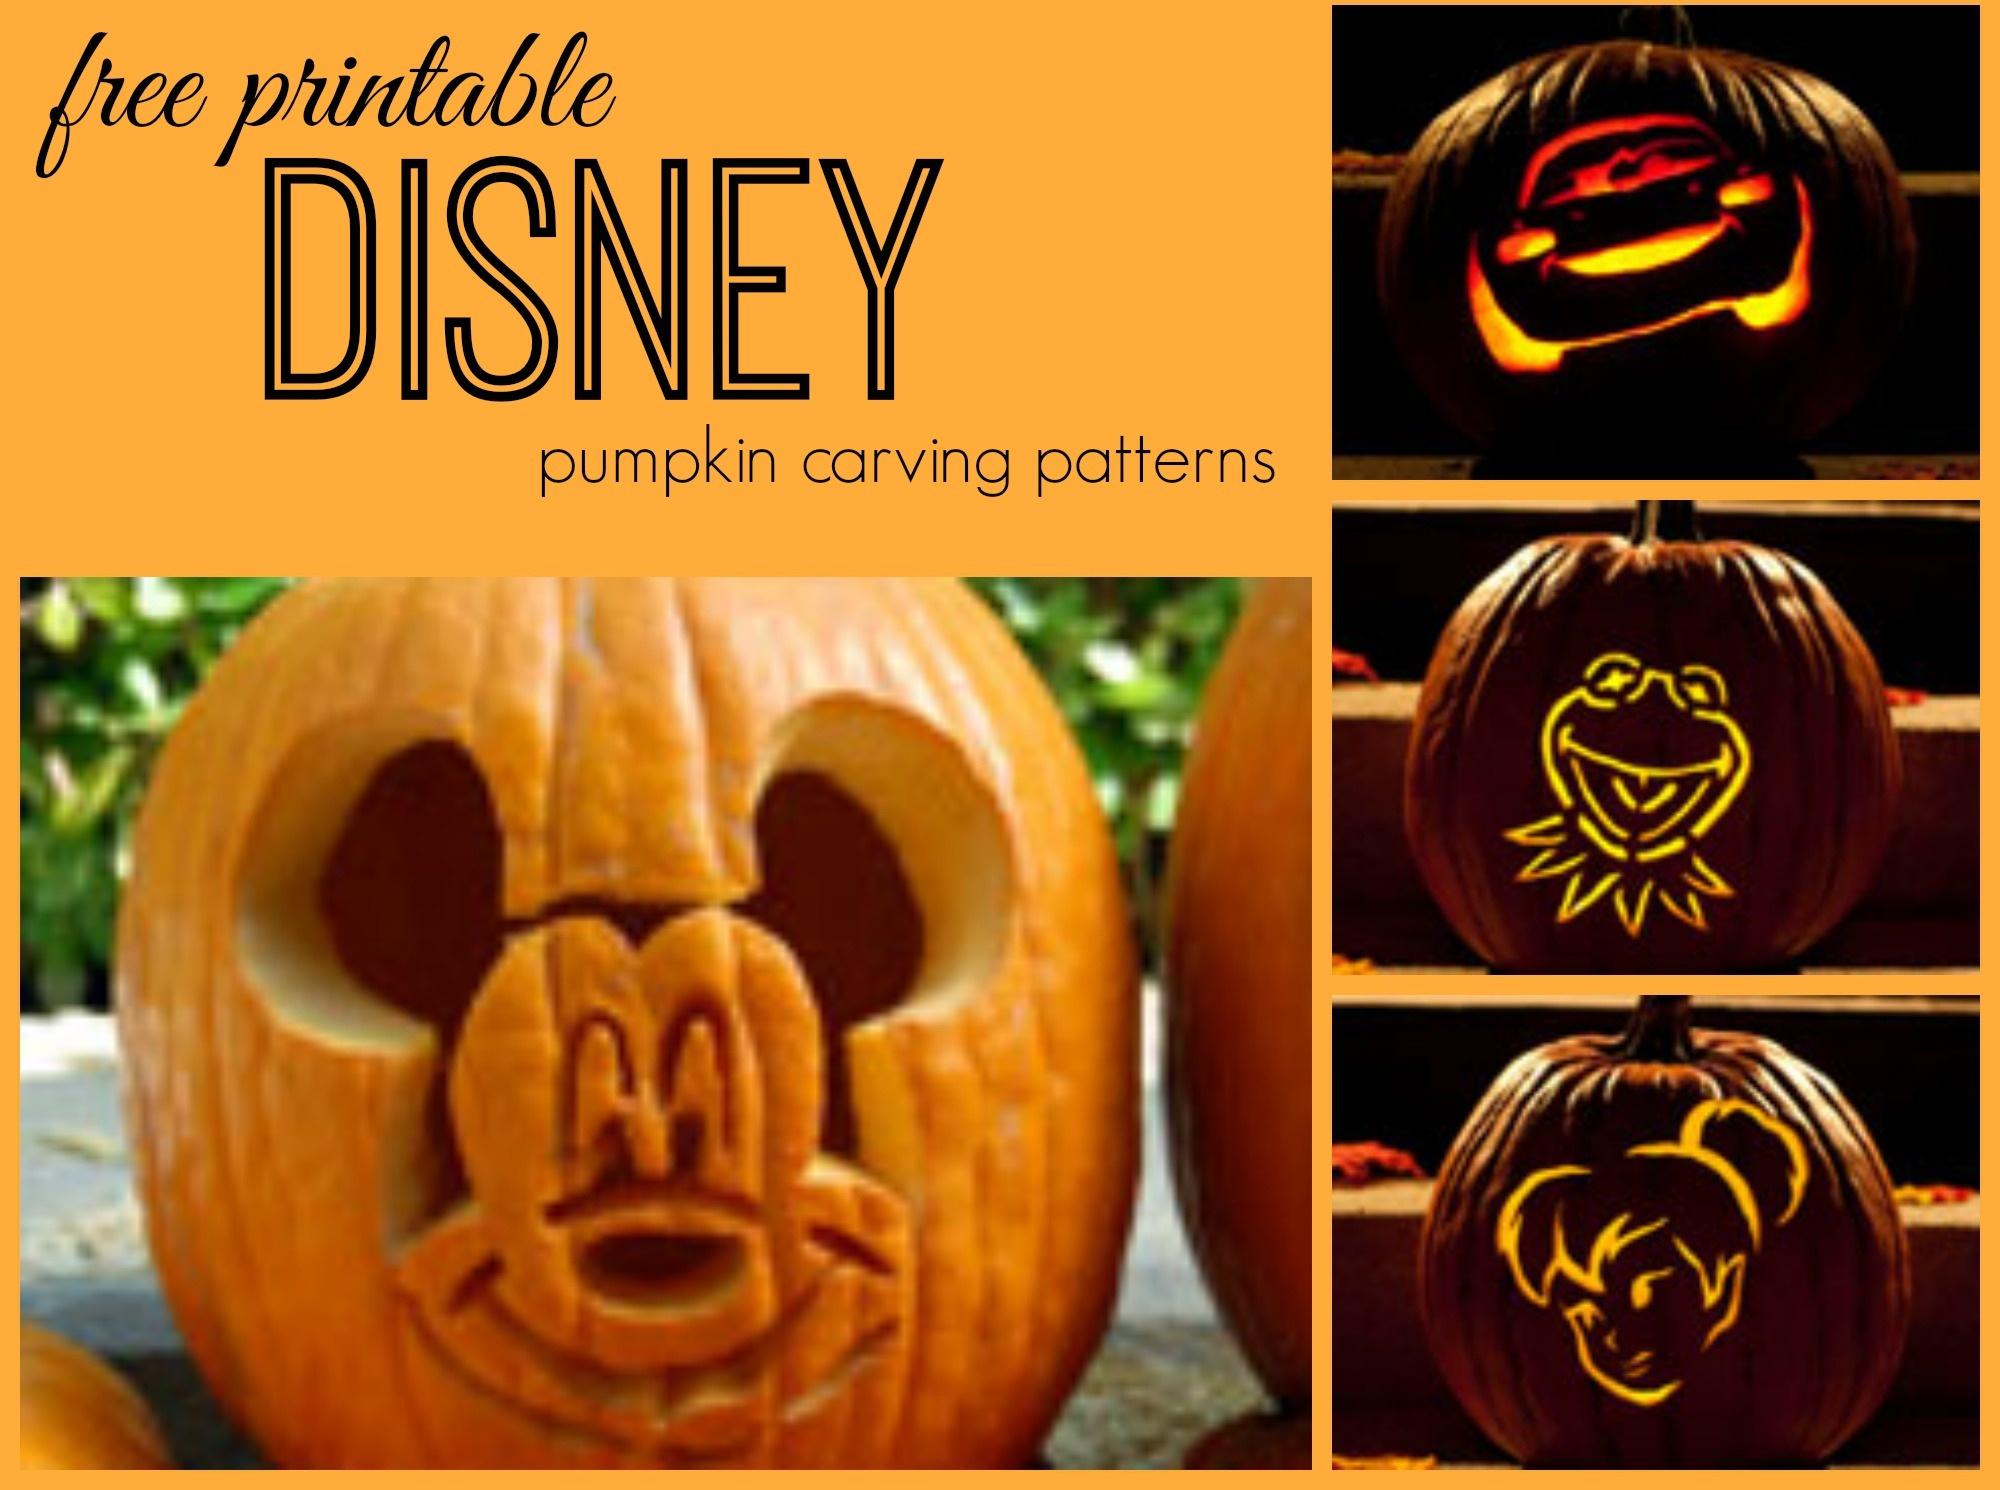 Disney Pumpkin Carving Patterns - Frugal Fanatic - Pumpkin Patterns Free Printable